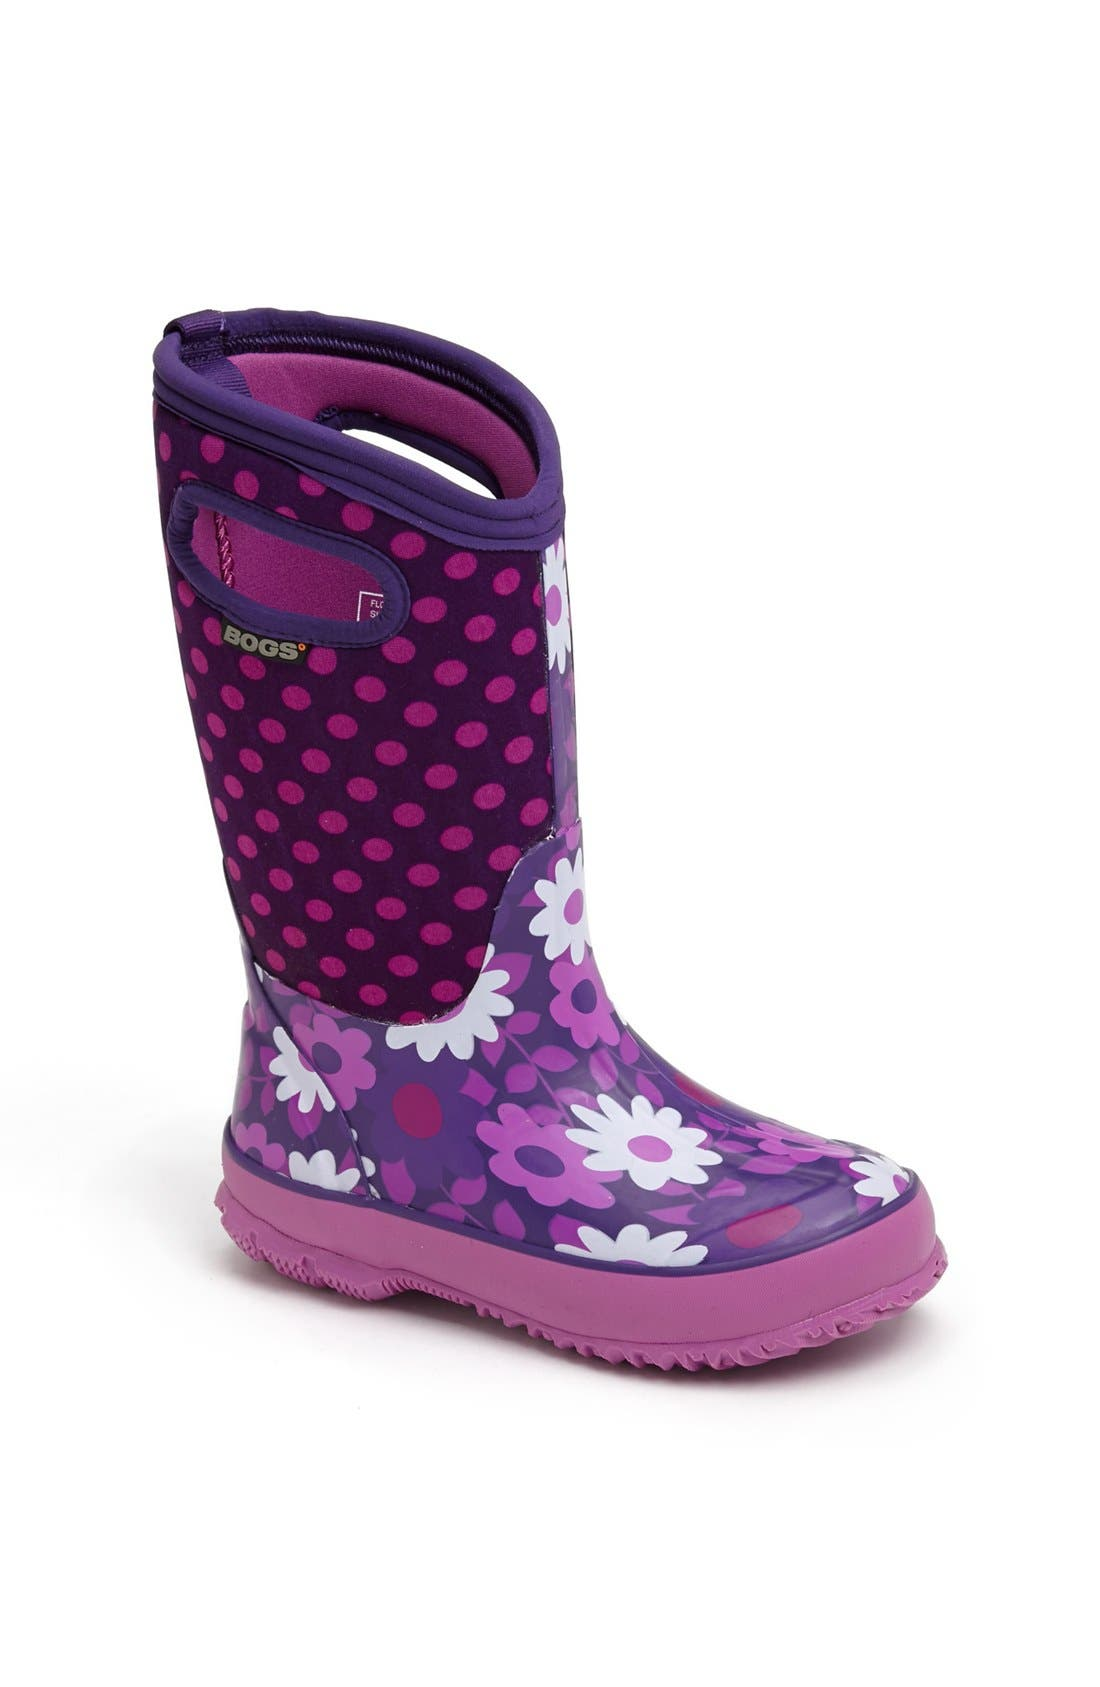 Main Image - Bogs 'Classic High - Flower Dot' Waterproof Boot (Walker, Toddler, Little Kid & Big Kid)